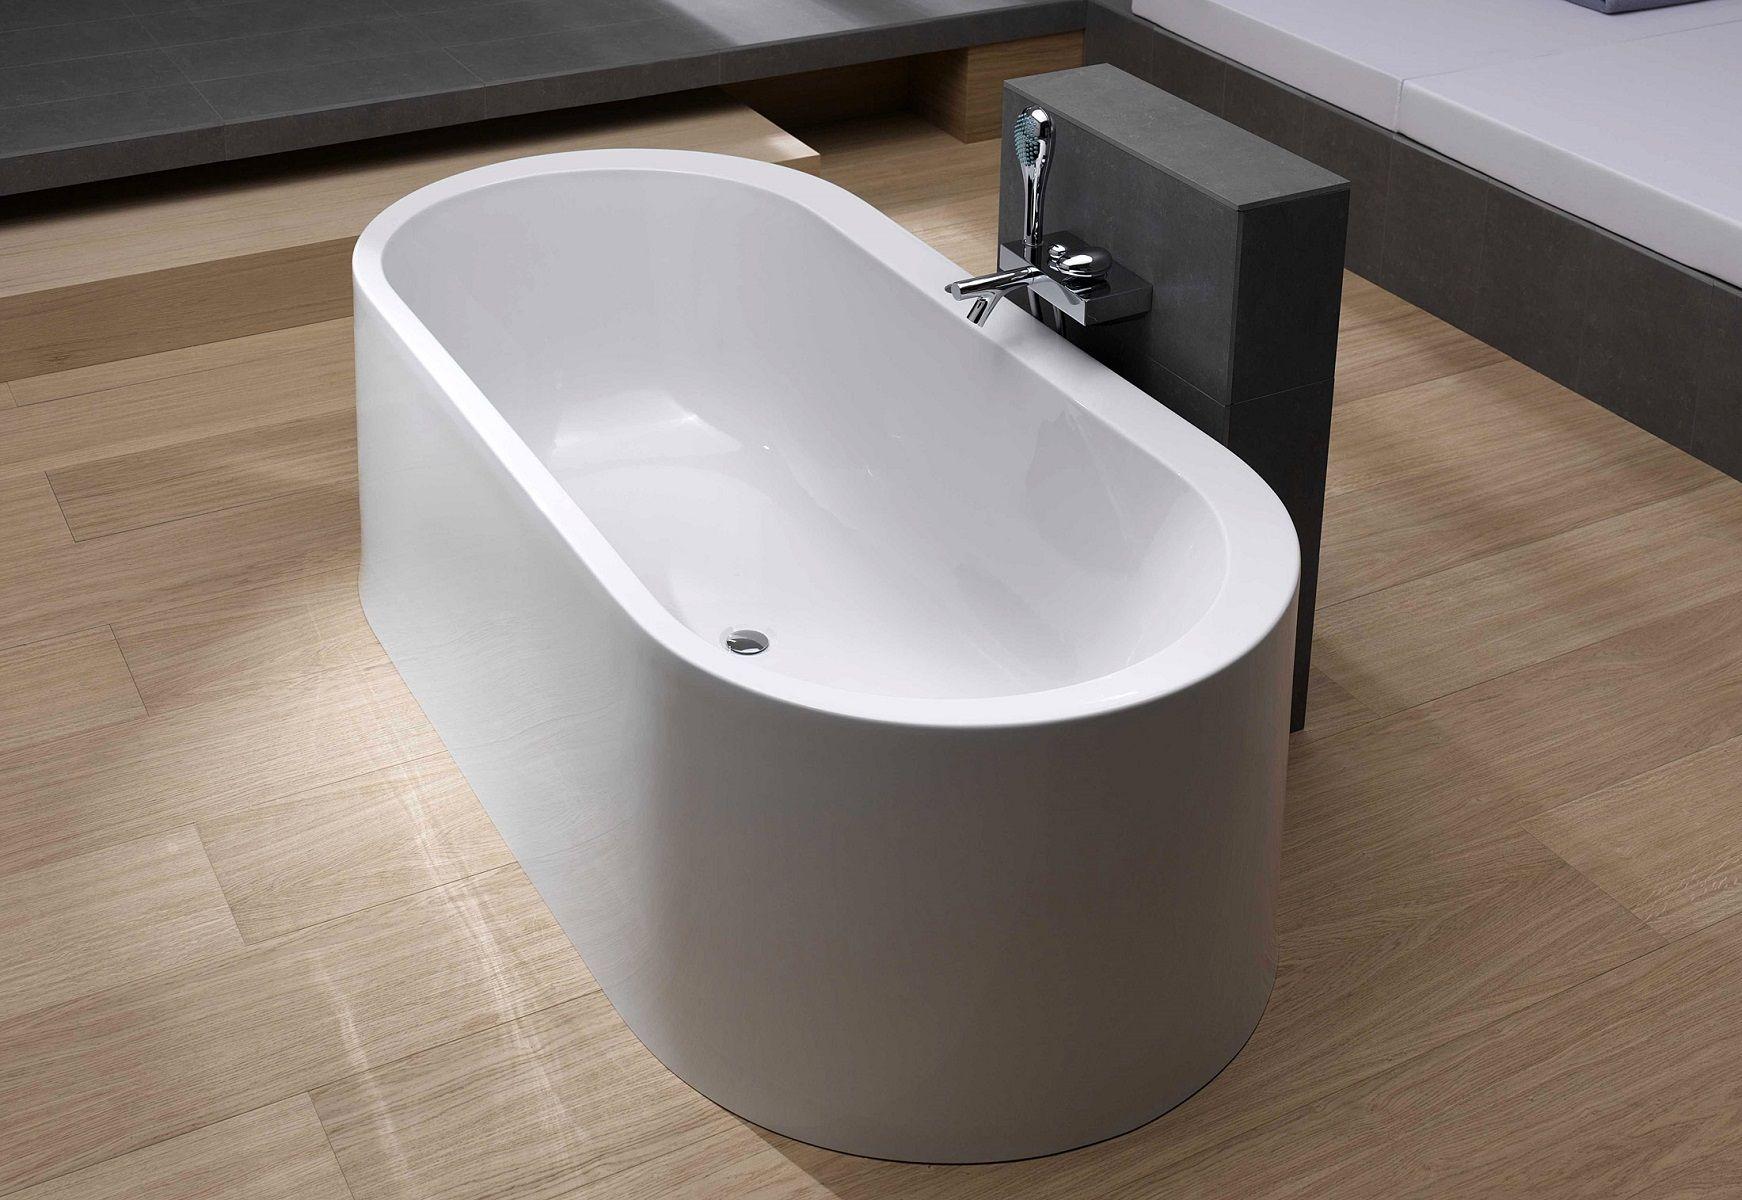 Aquatica Innovation Wht Freestanding Acrylic Bathtub Acrylic Bathtub Free Standing Bath Tub Bathtub